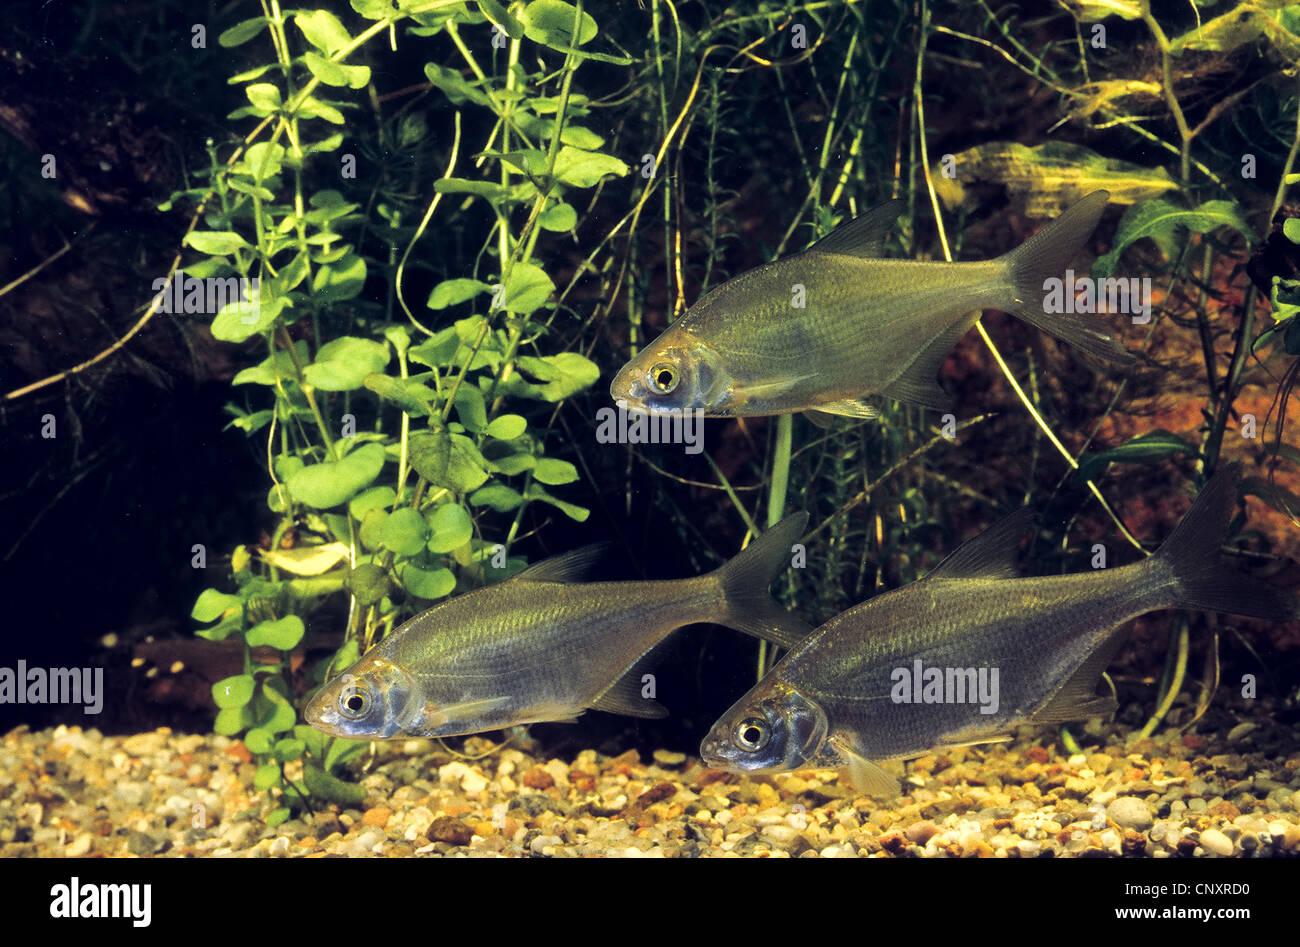 Freshwater juvenile fish - Stock Photo Common Bream Freshwater Bream Carp Bream Abramis Brama Juvenile Fishes